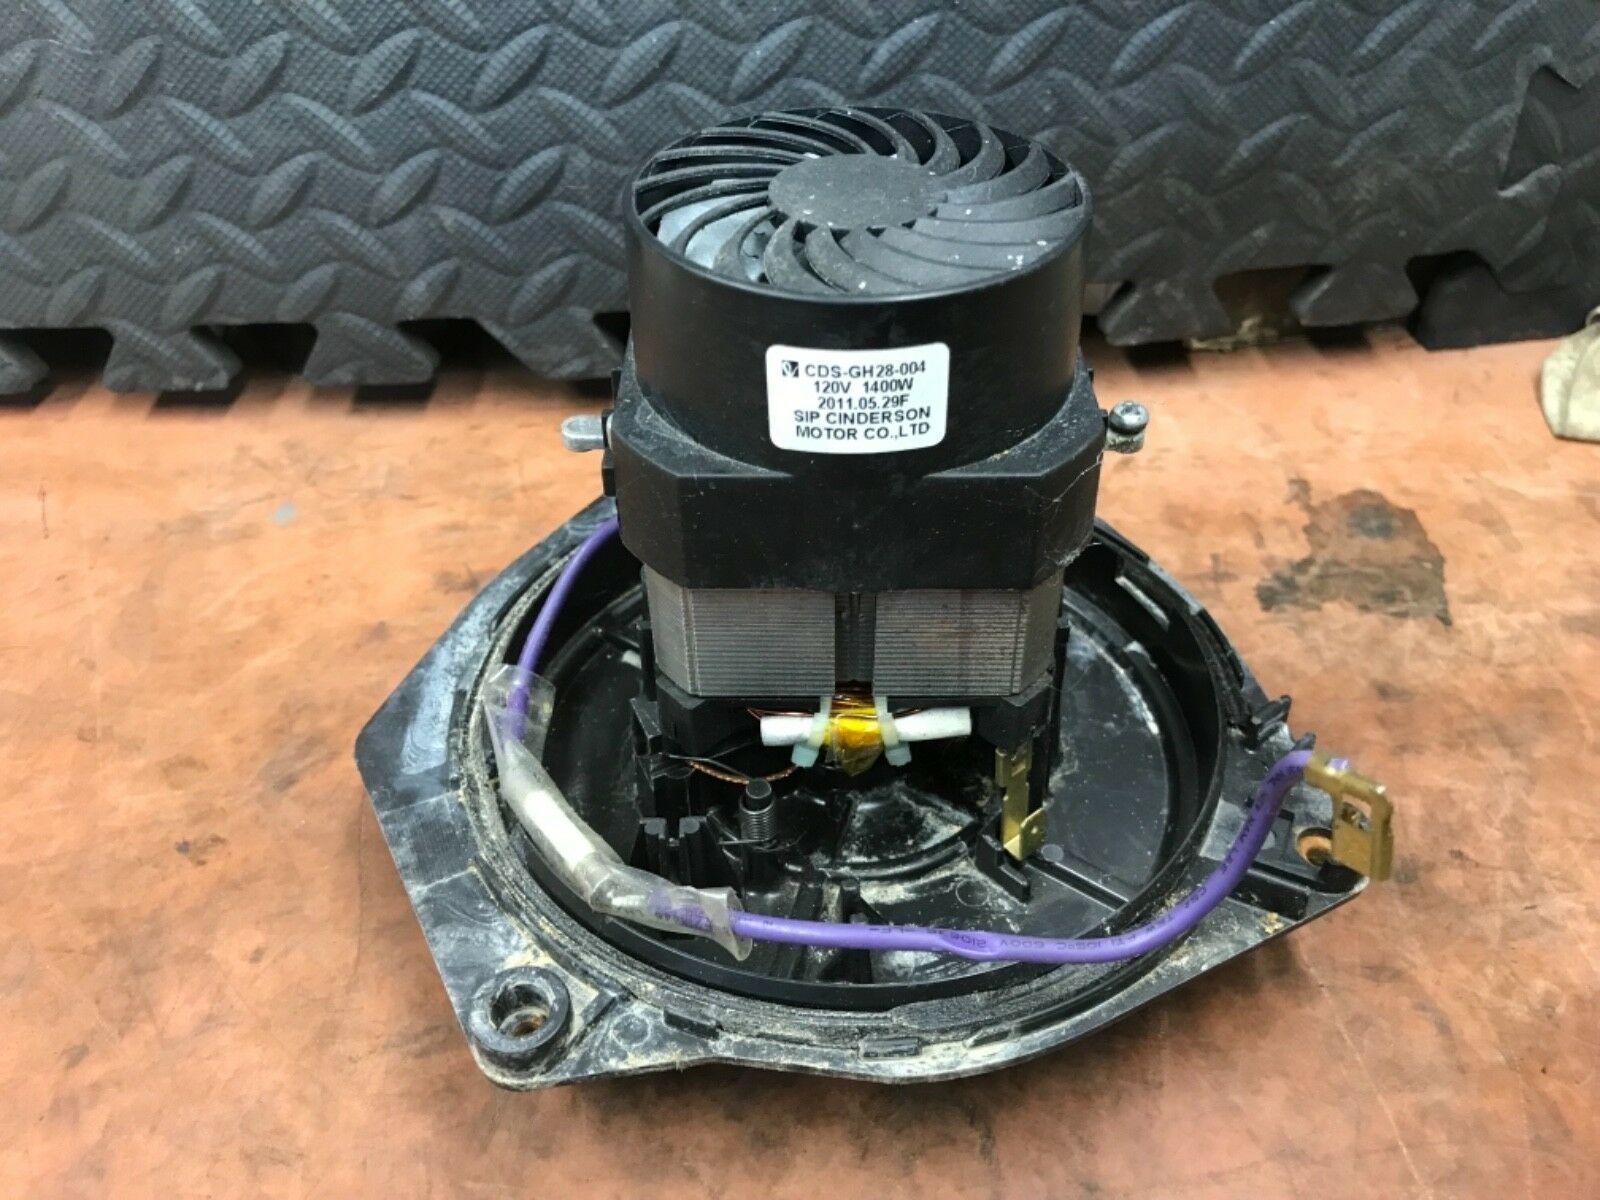 Hoover Spin Scrub Floor Cleaner Mod F5915100 Motor 24 99